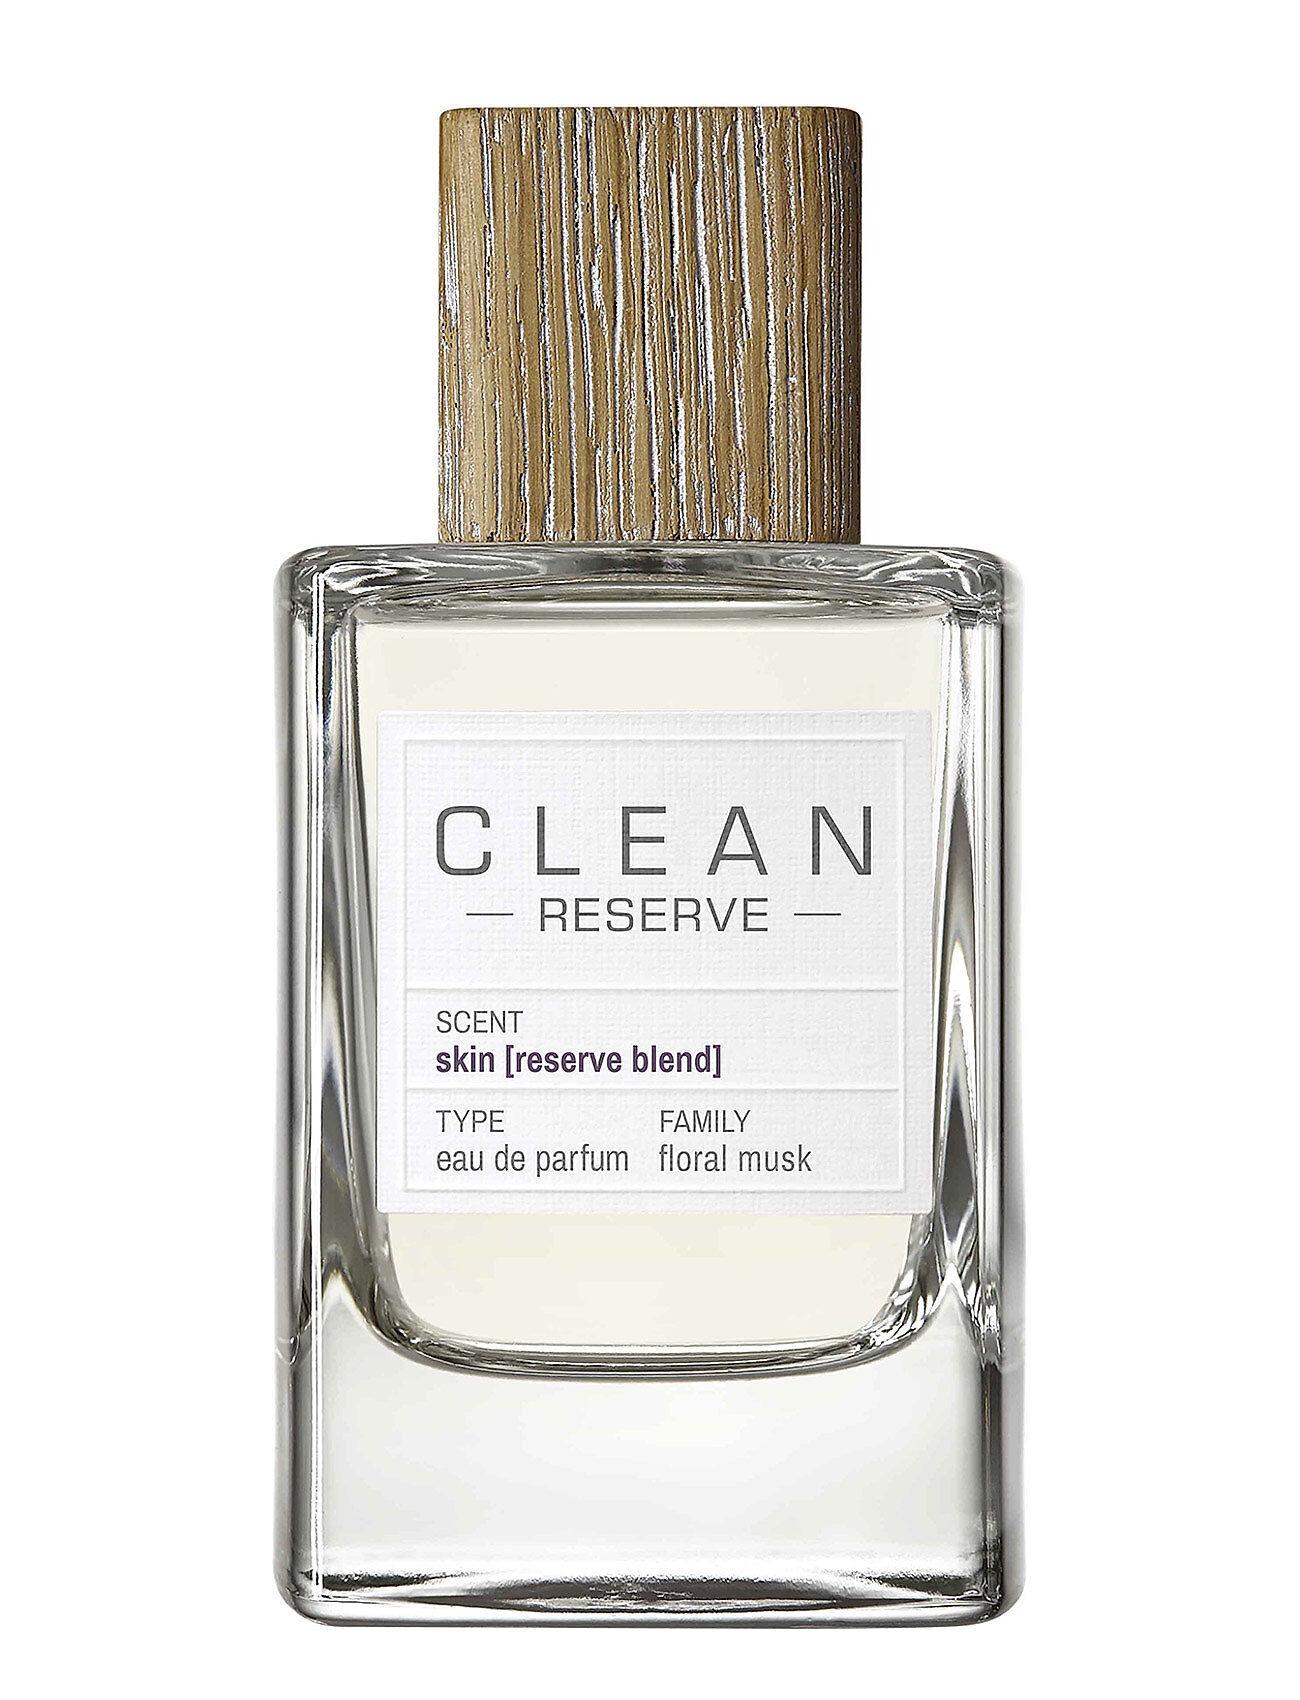 Clean Reserve Blends Skin